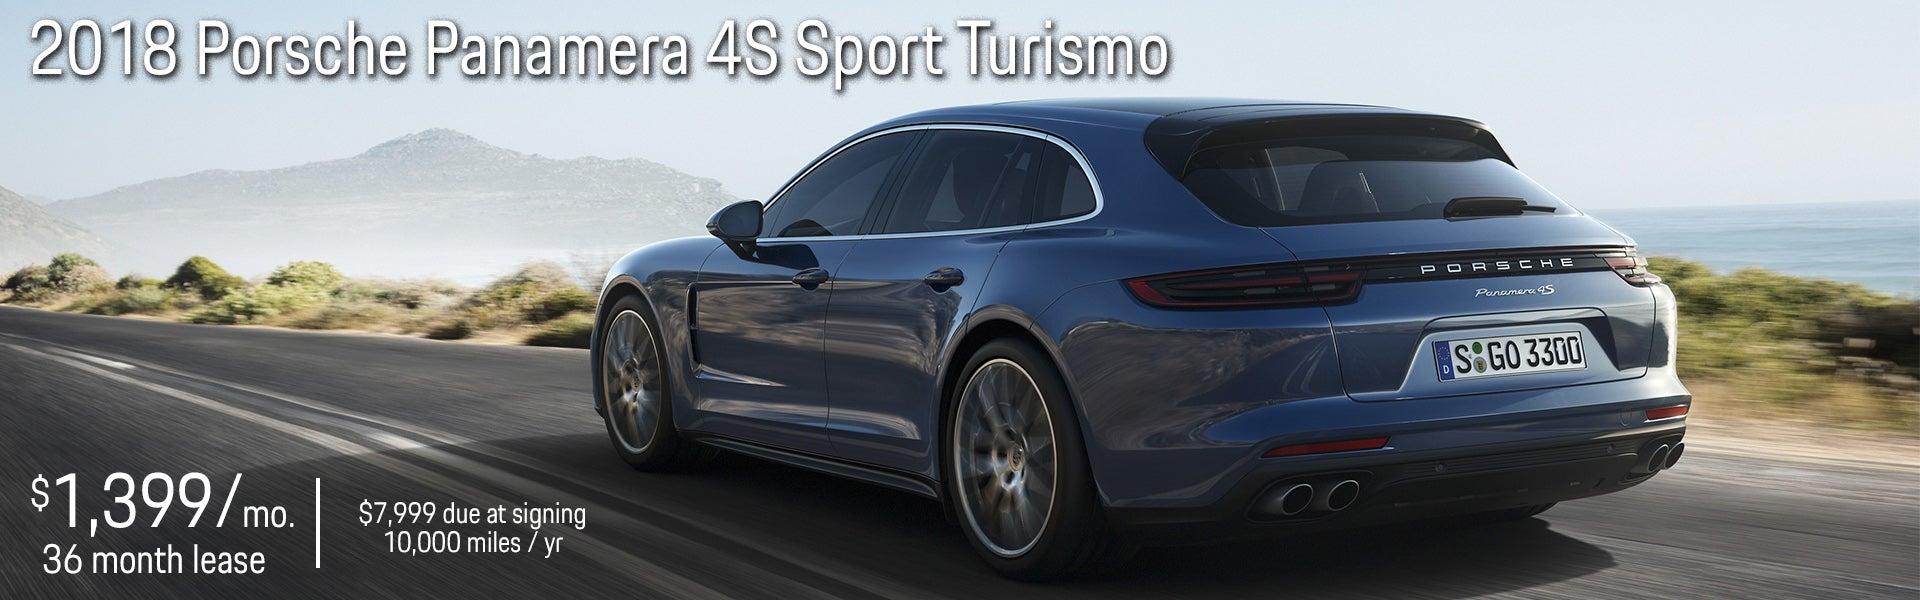 Porsche Panamera 4s Sport Turismo Lease Special